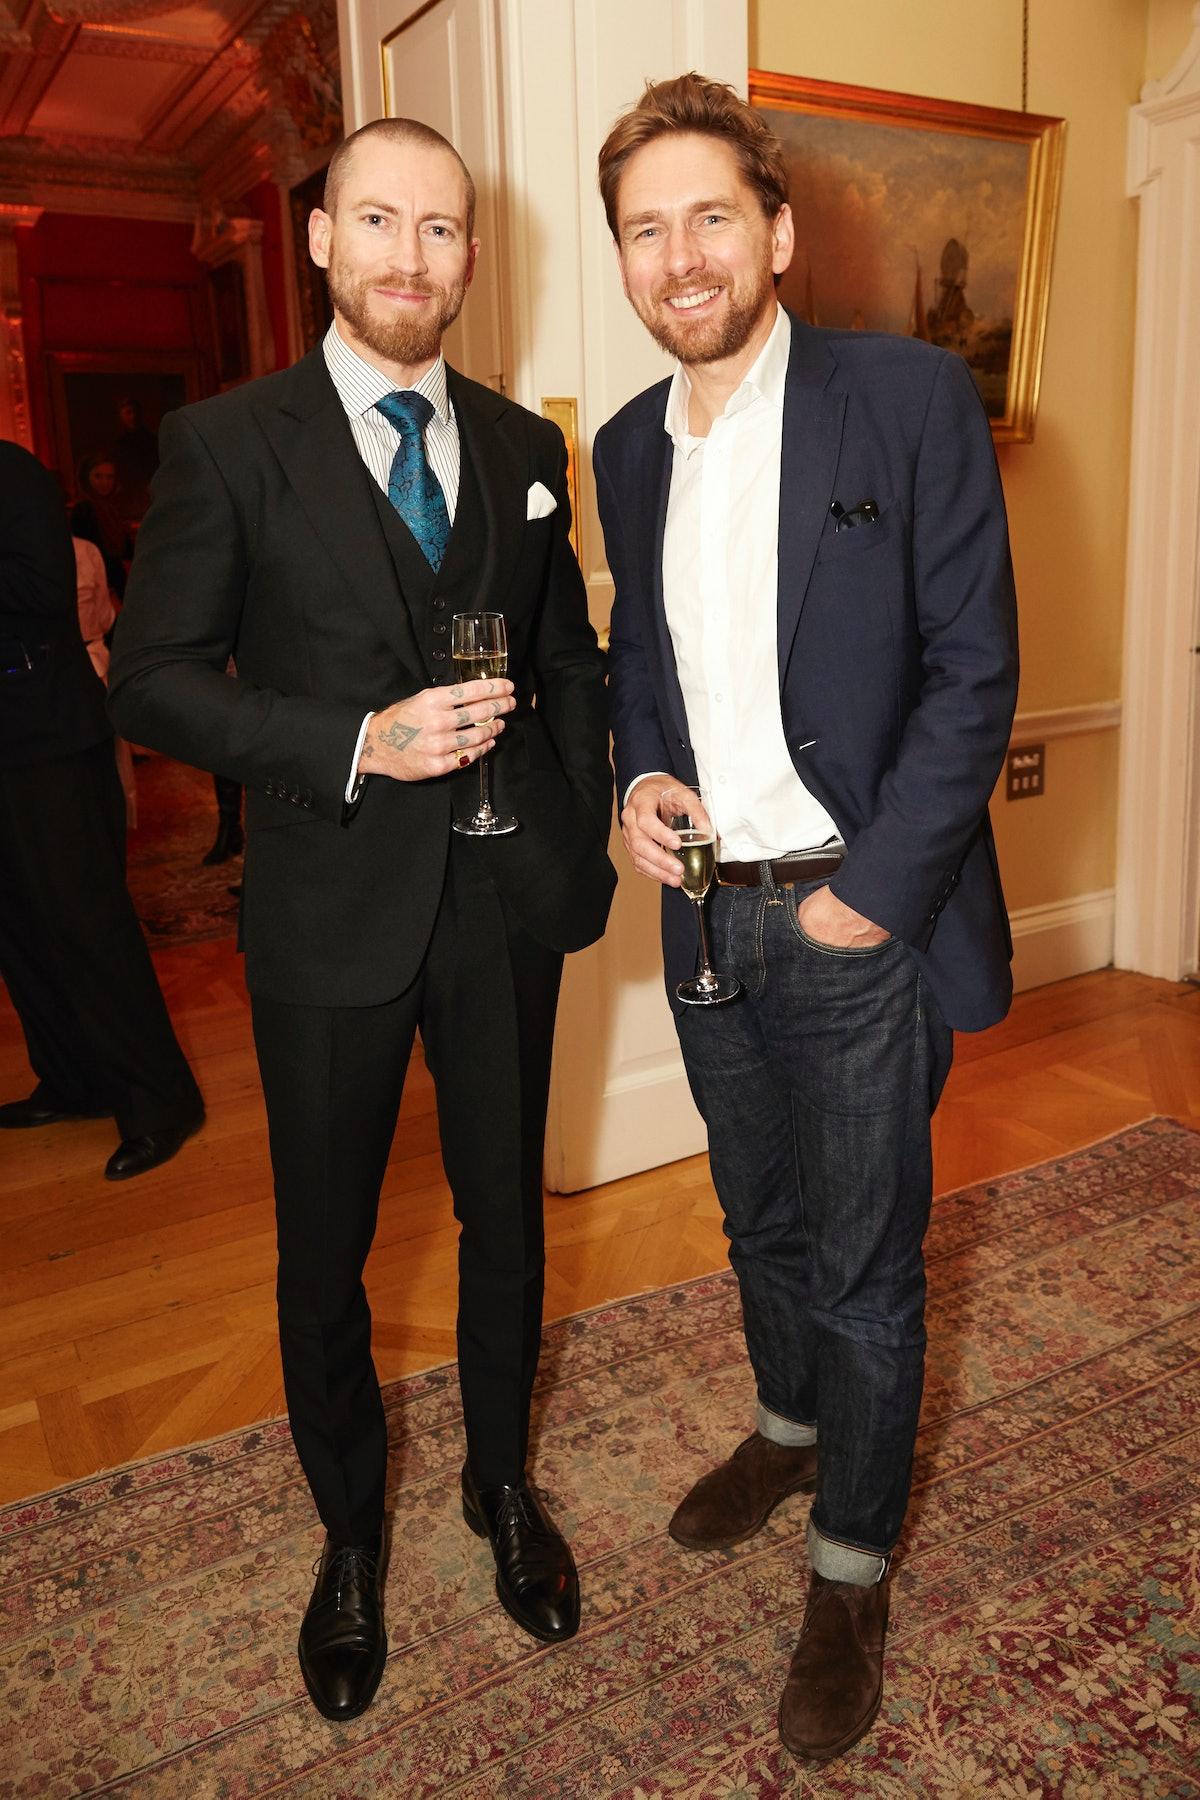 Justin O'Shea and Rupert Sanderson